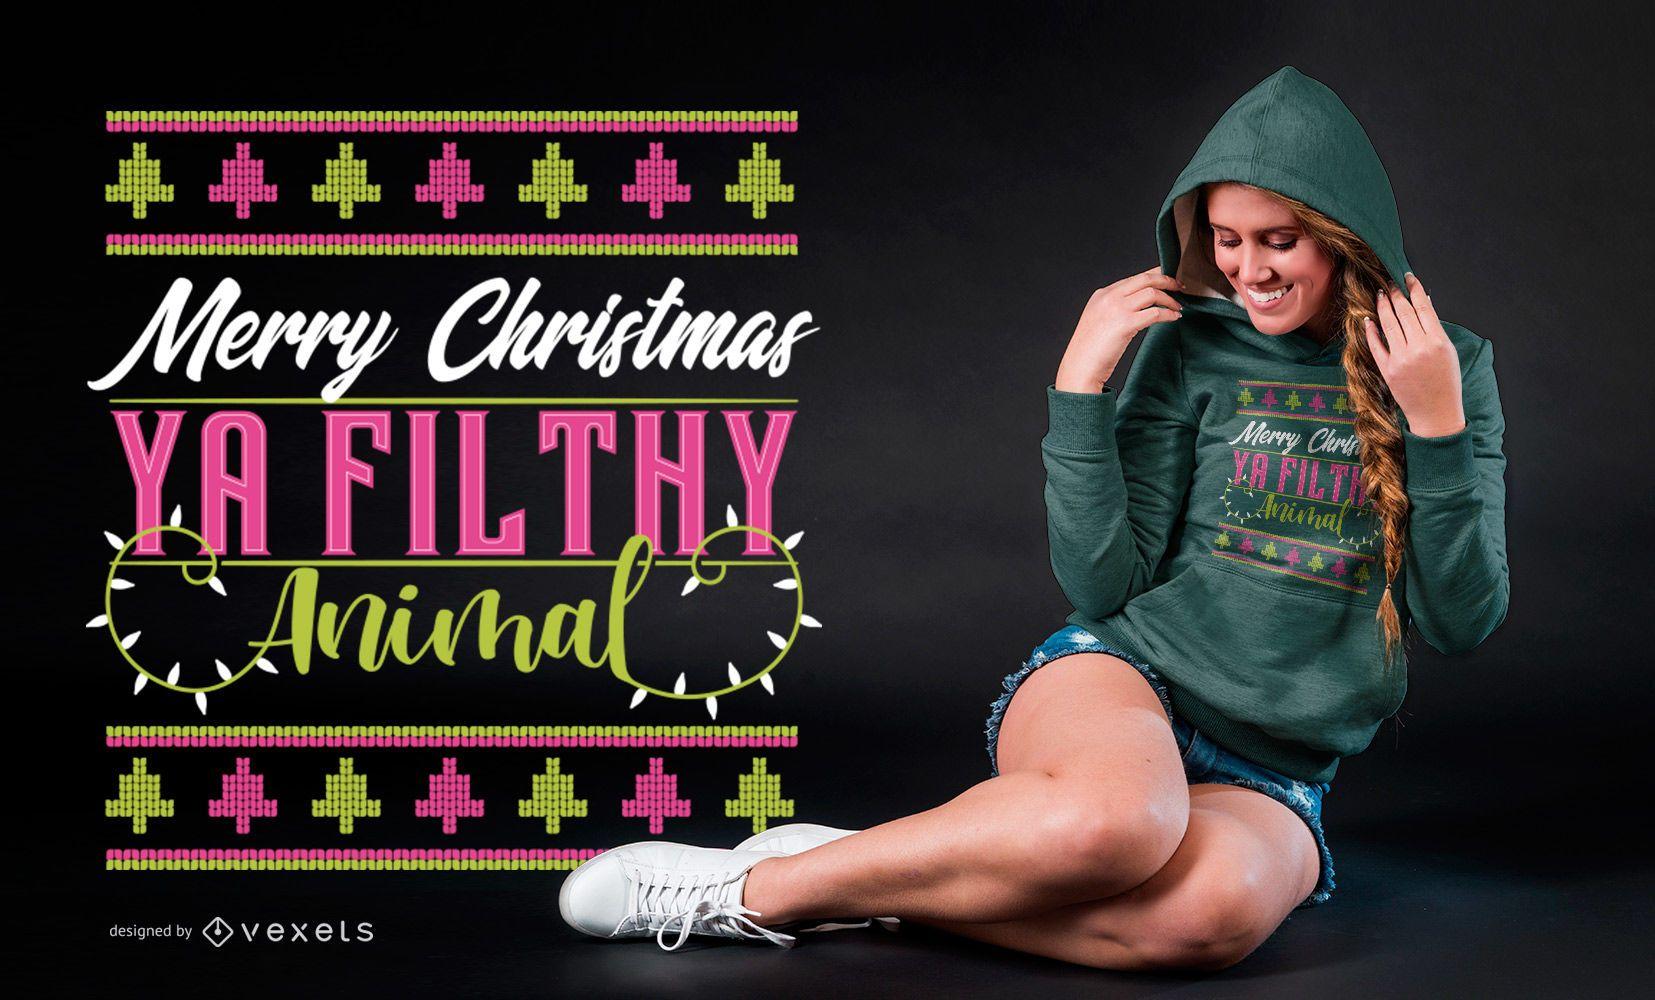 Feliz Natal Ya Filthy Animal T-shirt Design